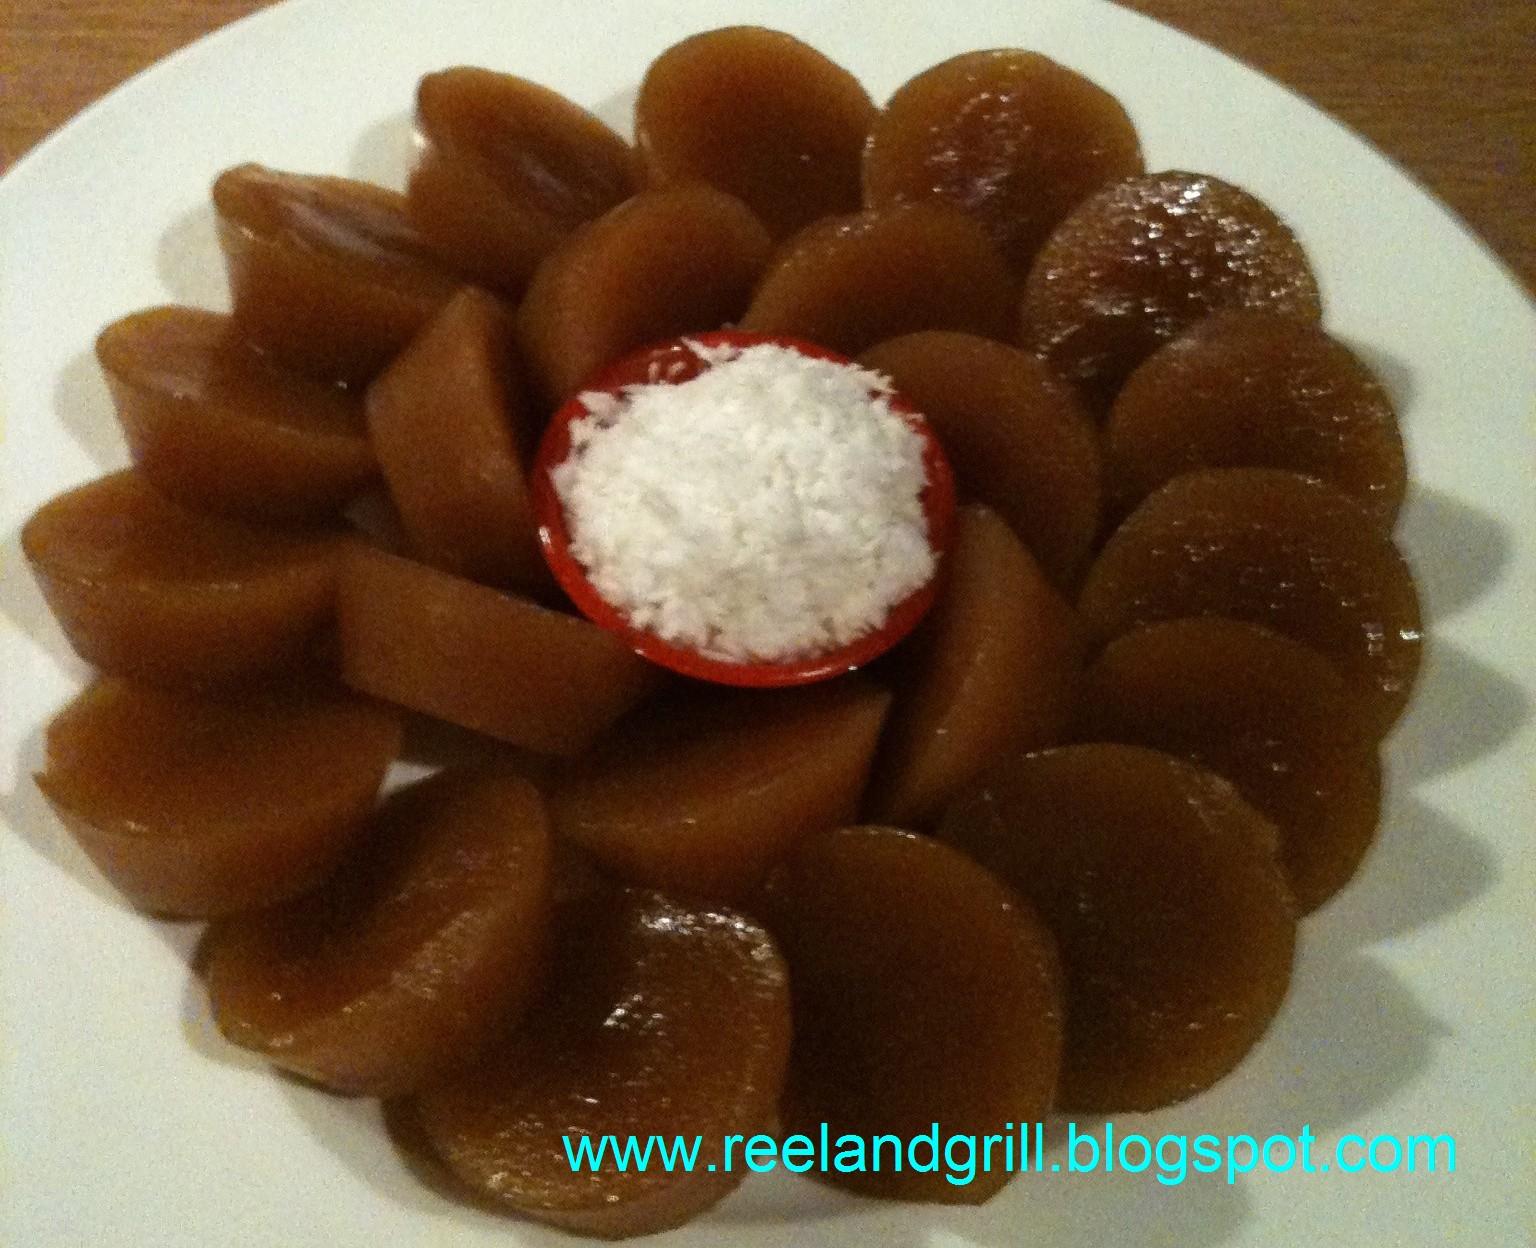 Reel And Grill Kutsinta Or Cuchinta A La Lalaine Filipino Brown